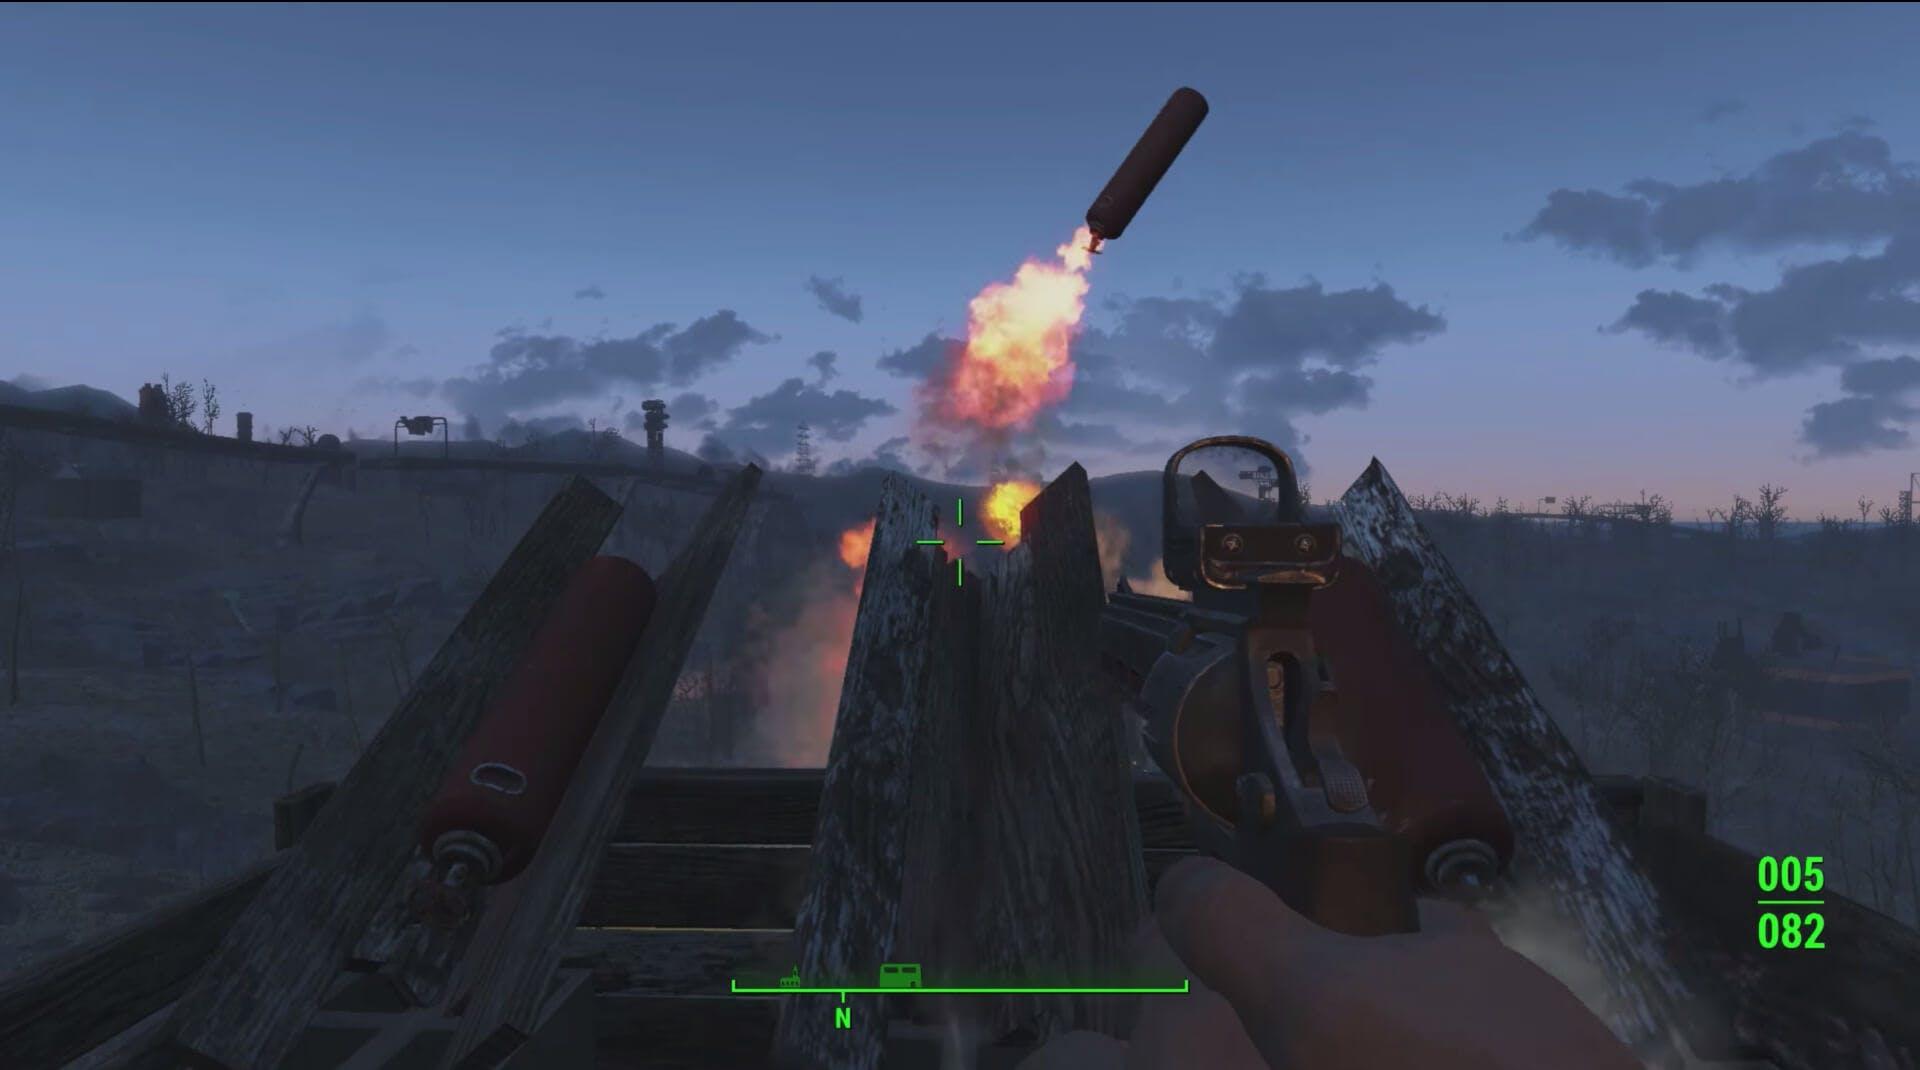 Fireworks - Fallout 4 secrets